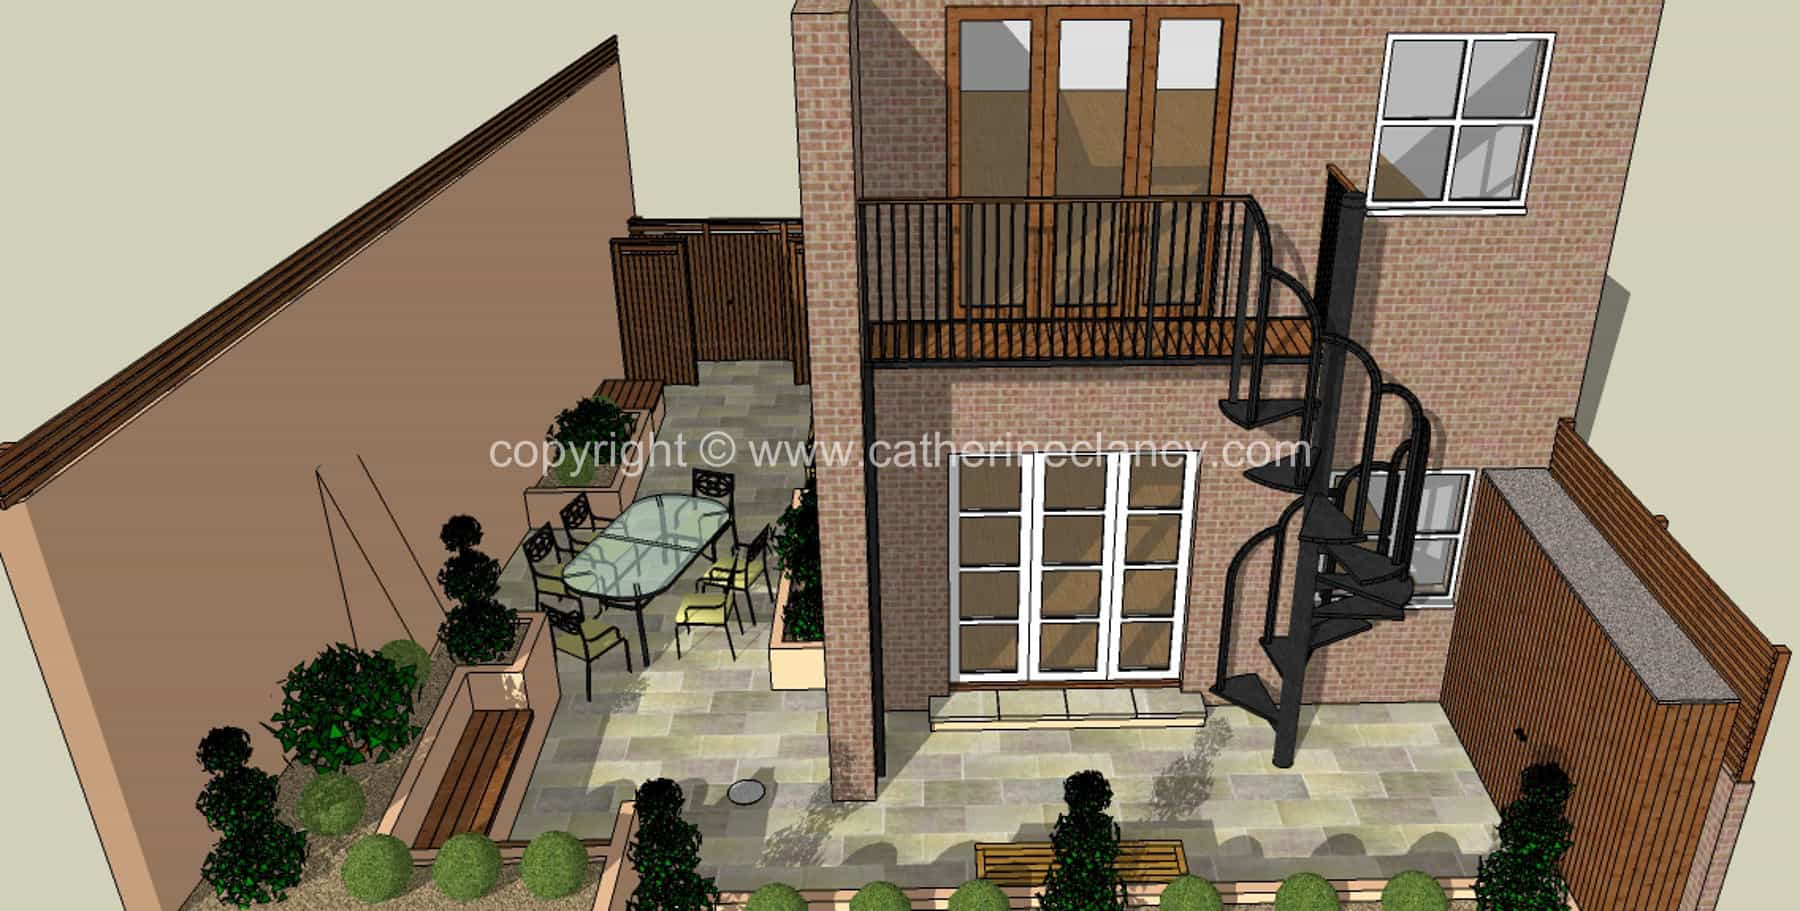 chic-courtyard-12